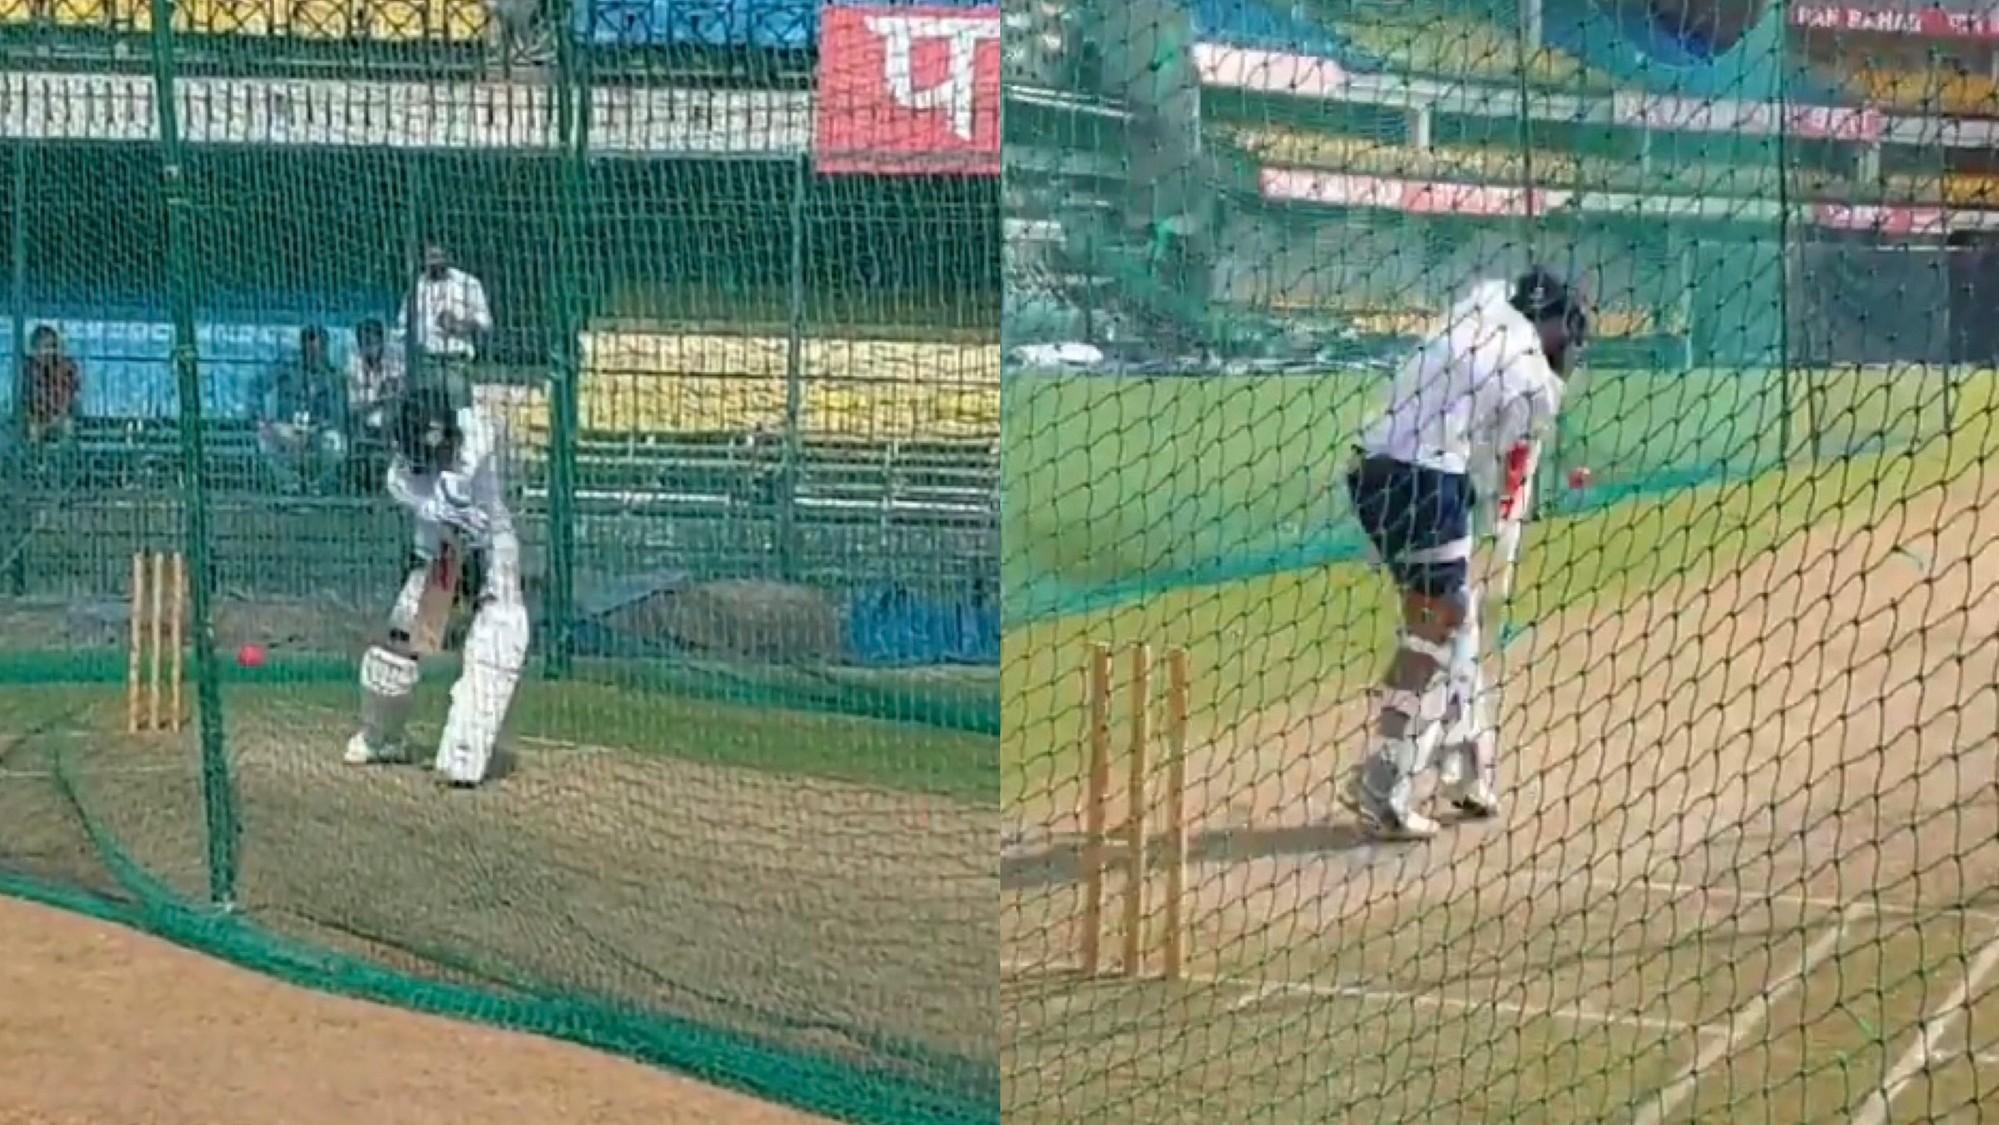 IND v BAN 2019: WATCH - Virat Kohli takes throwdowns with the pink ball